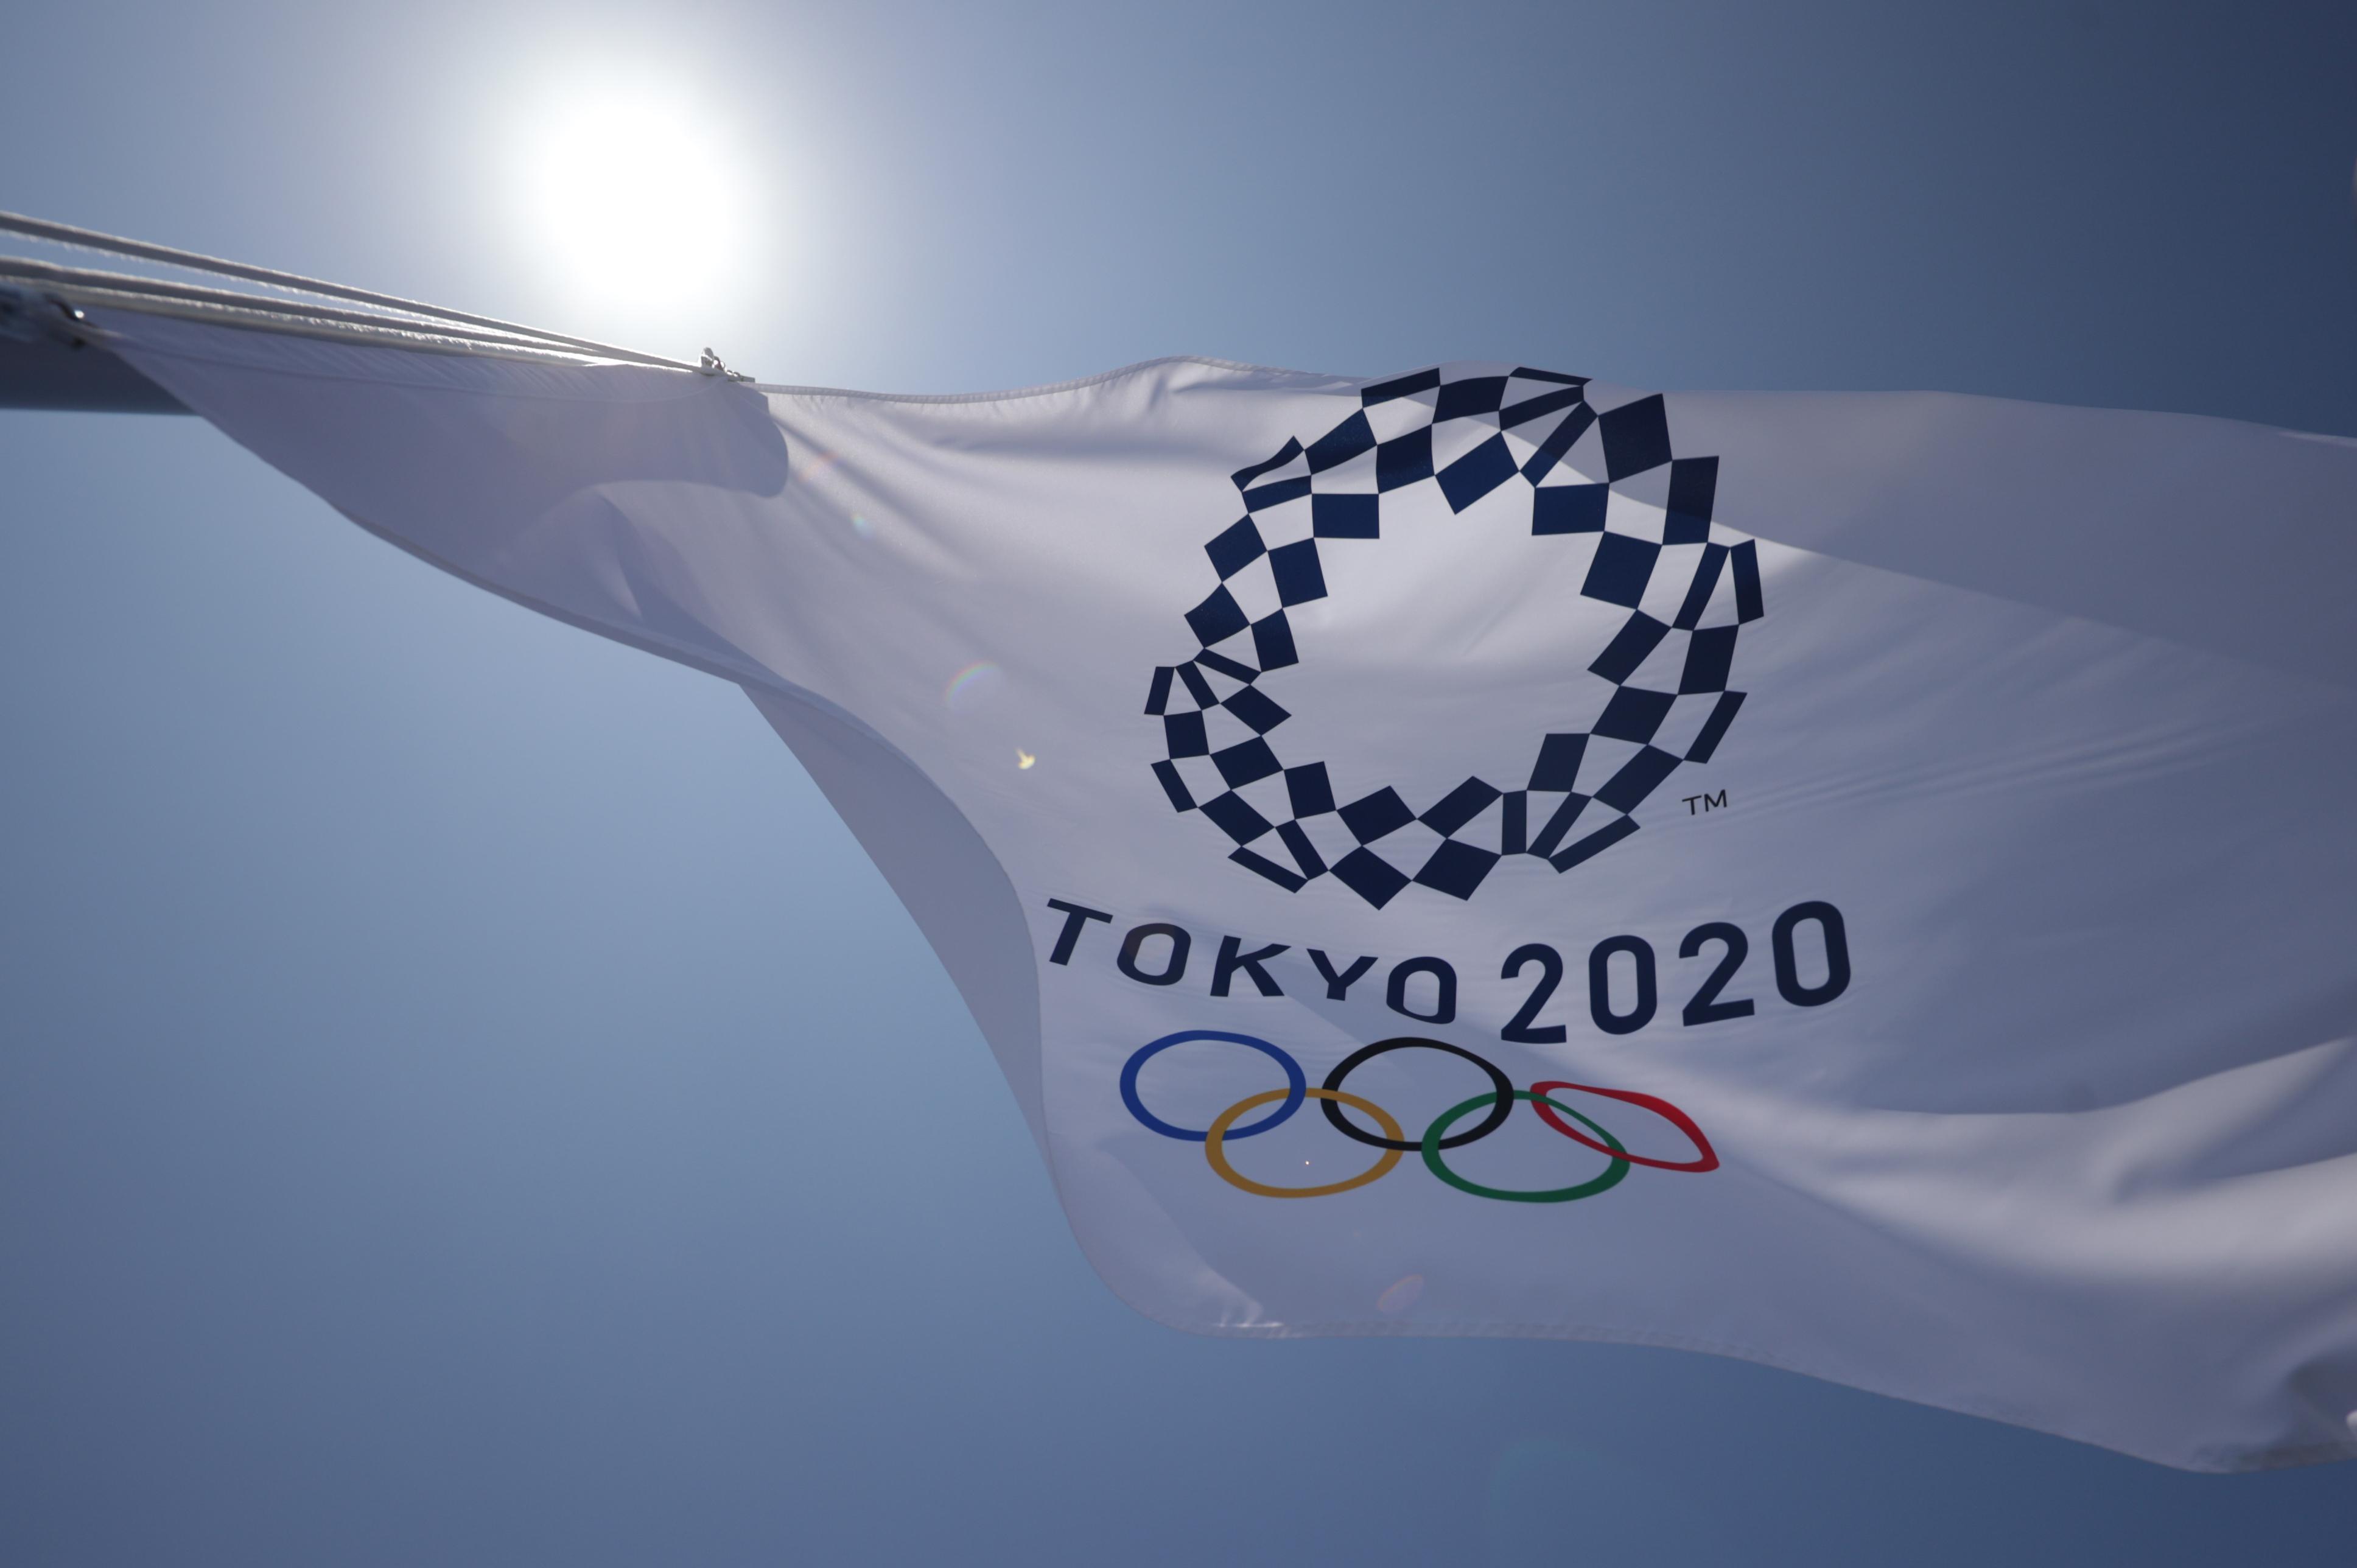 Tokyo 2020 Olympics - Tennis Training - Ariake Tennis Park, Tokyo, Japan - July 19, 2021 A Olympic flag flutters at the Ariake Tennis Park REUTERS/Hannah Mckay